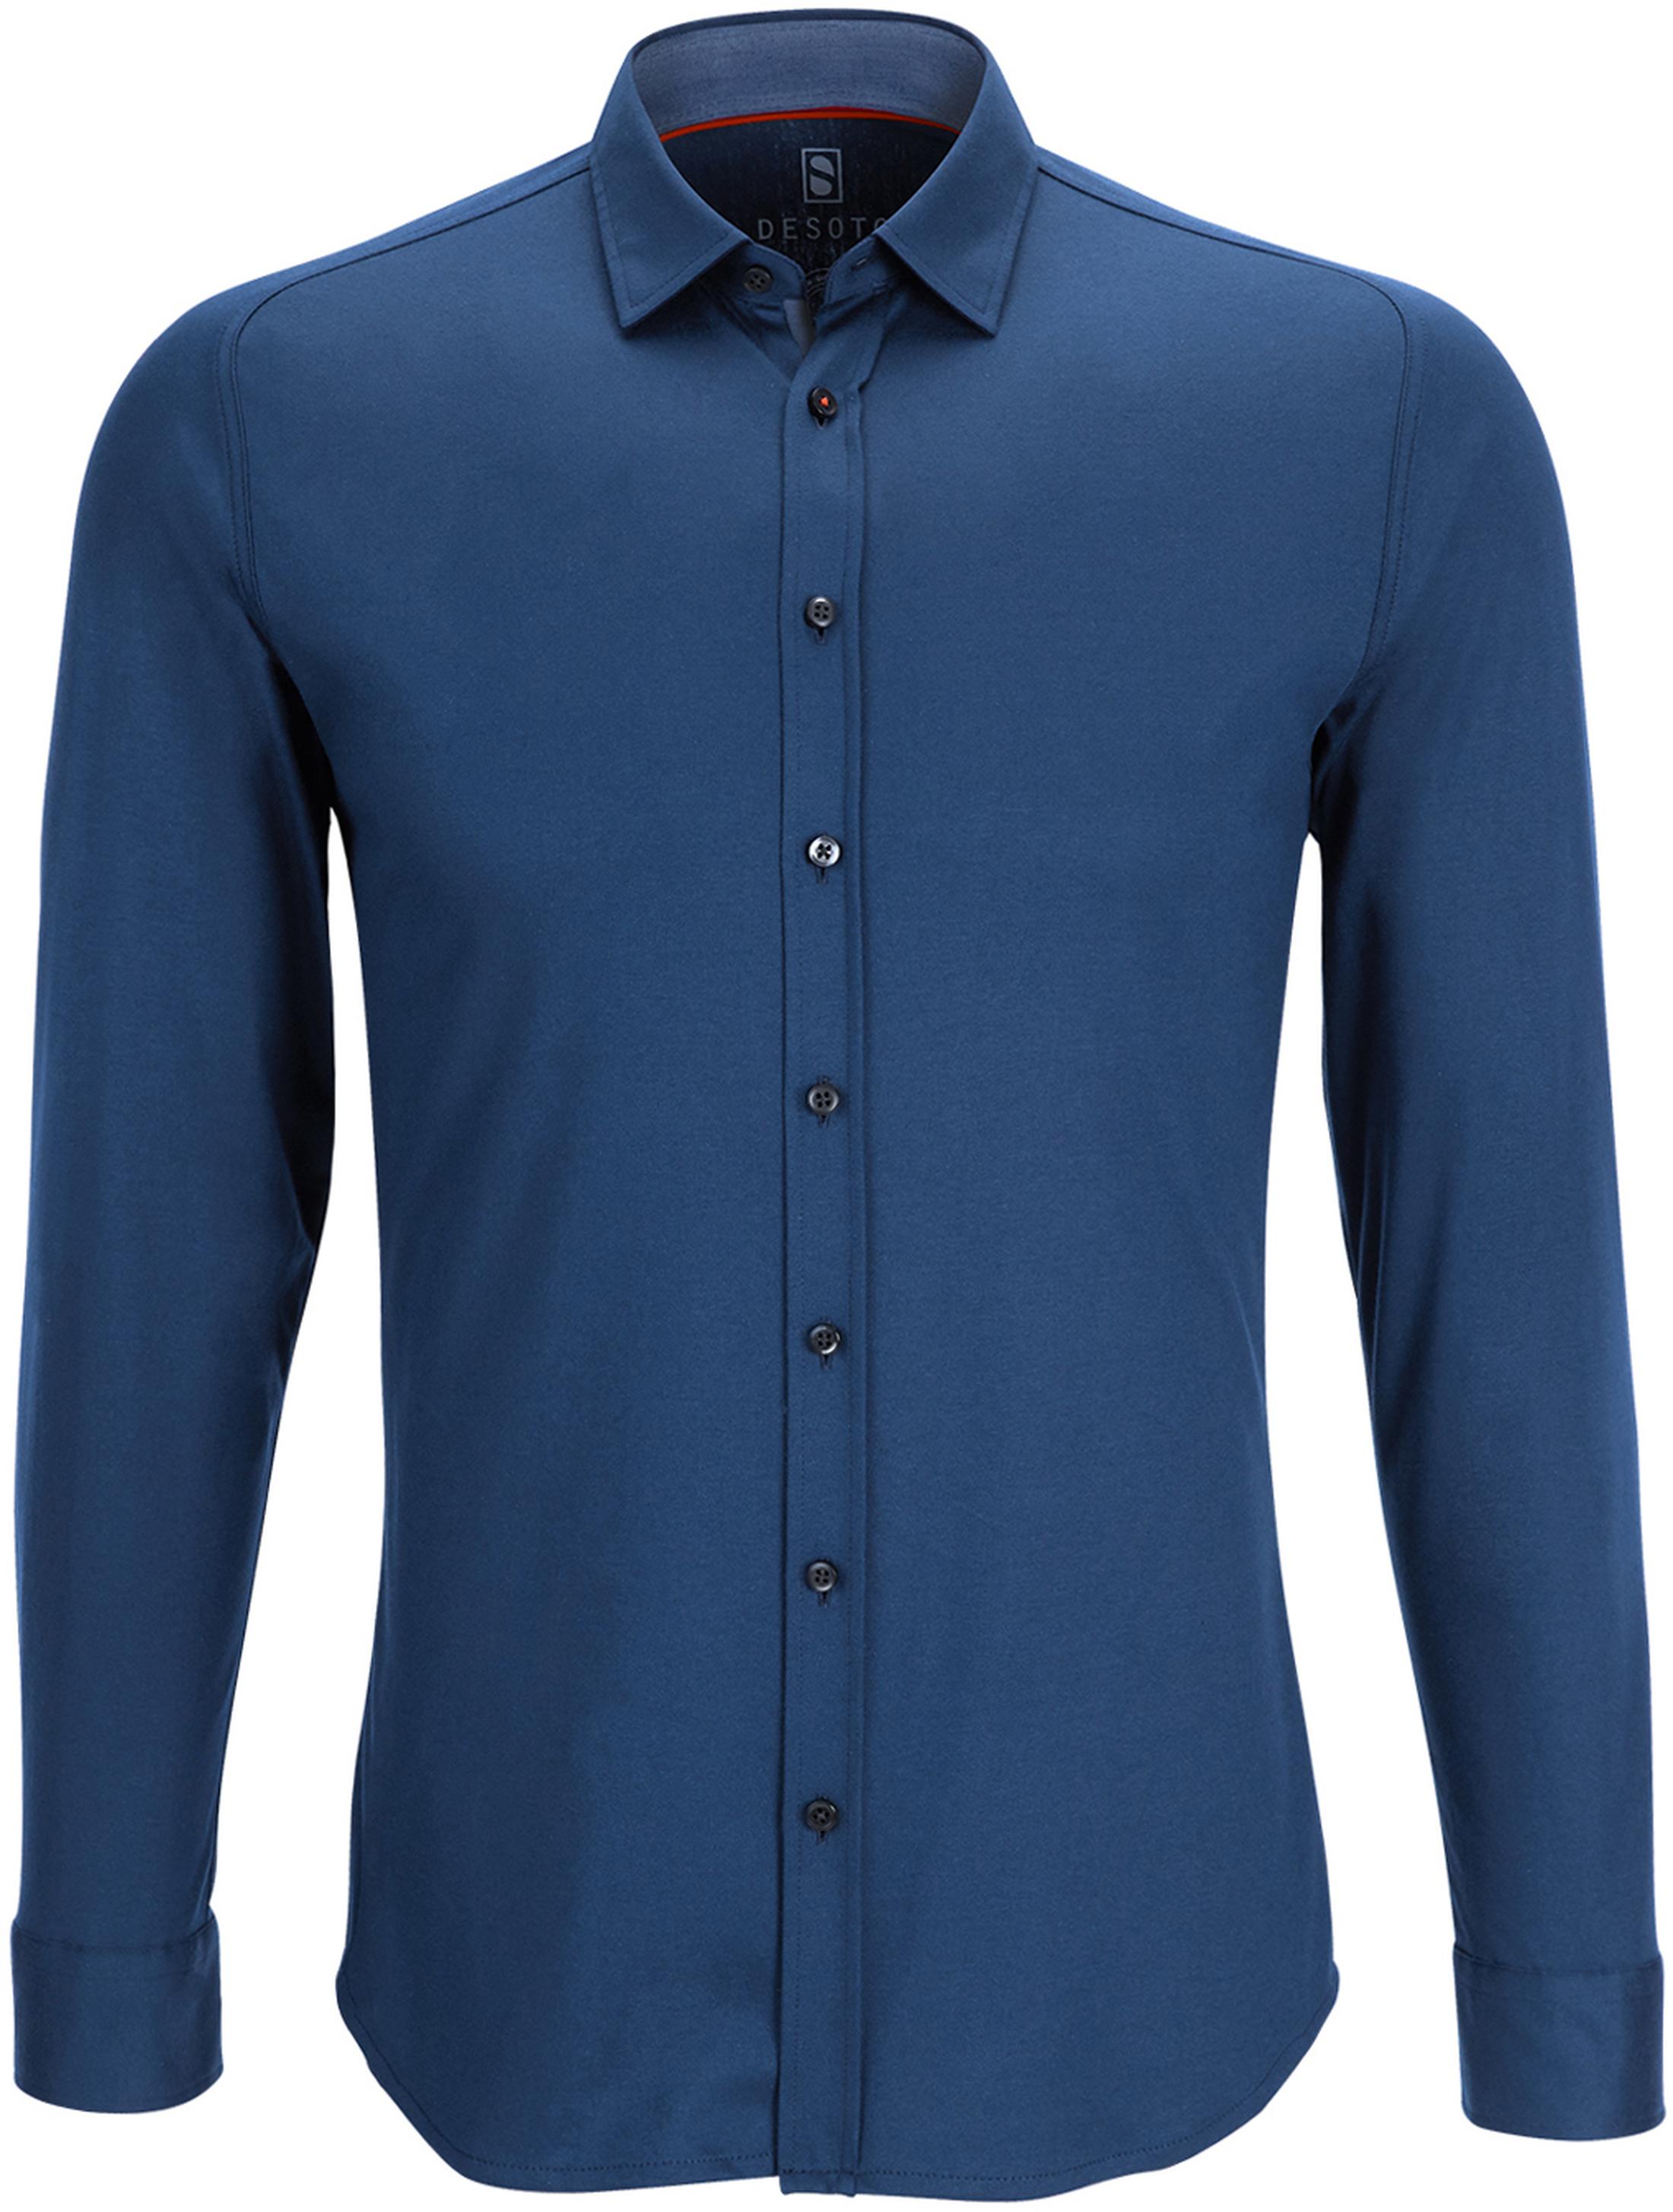 Desoto Shirt Non Iron Indigo Blue foto 0